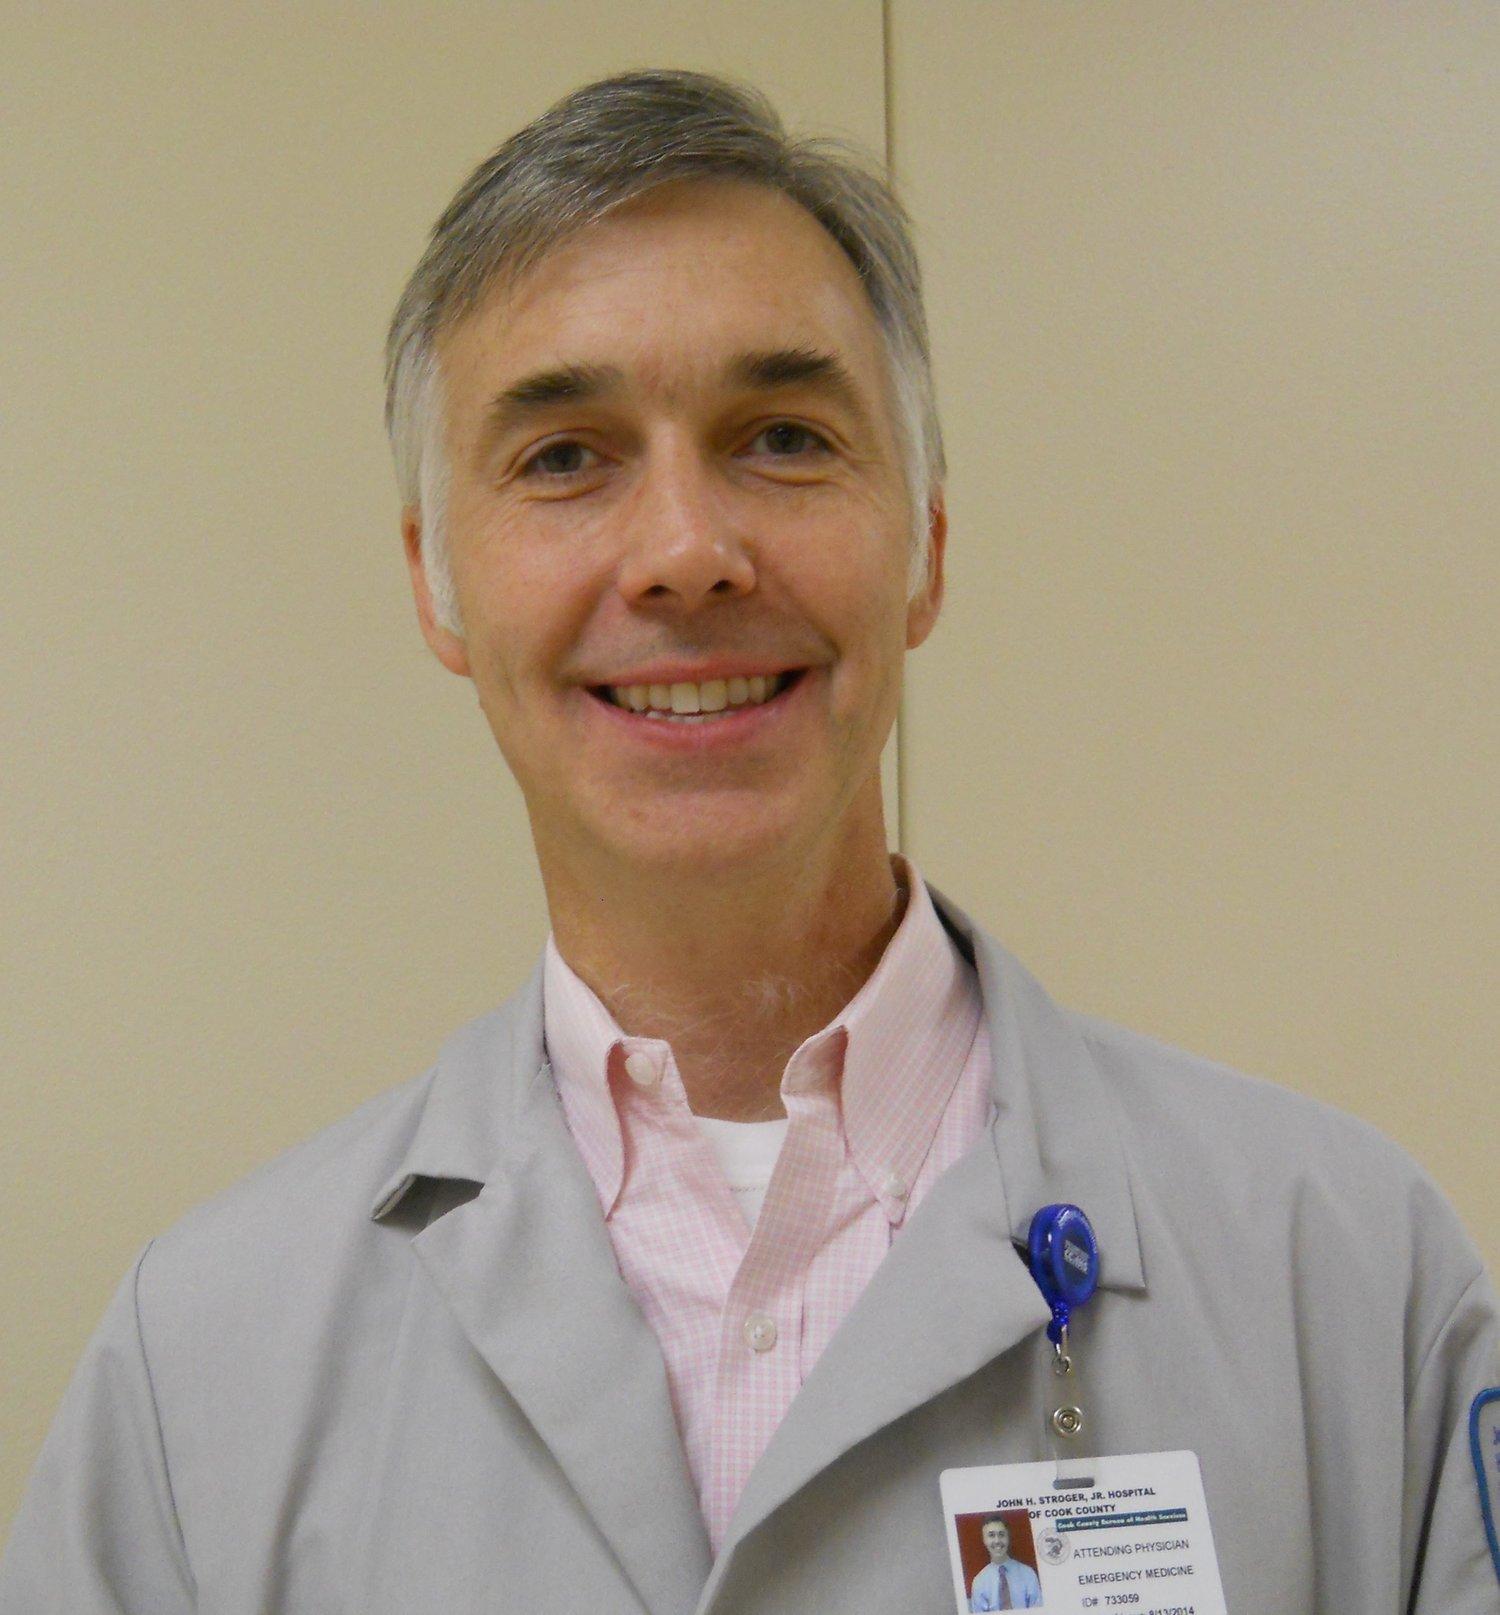 Faculty — Cook County Emergency Medicine Residency